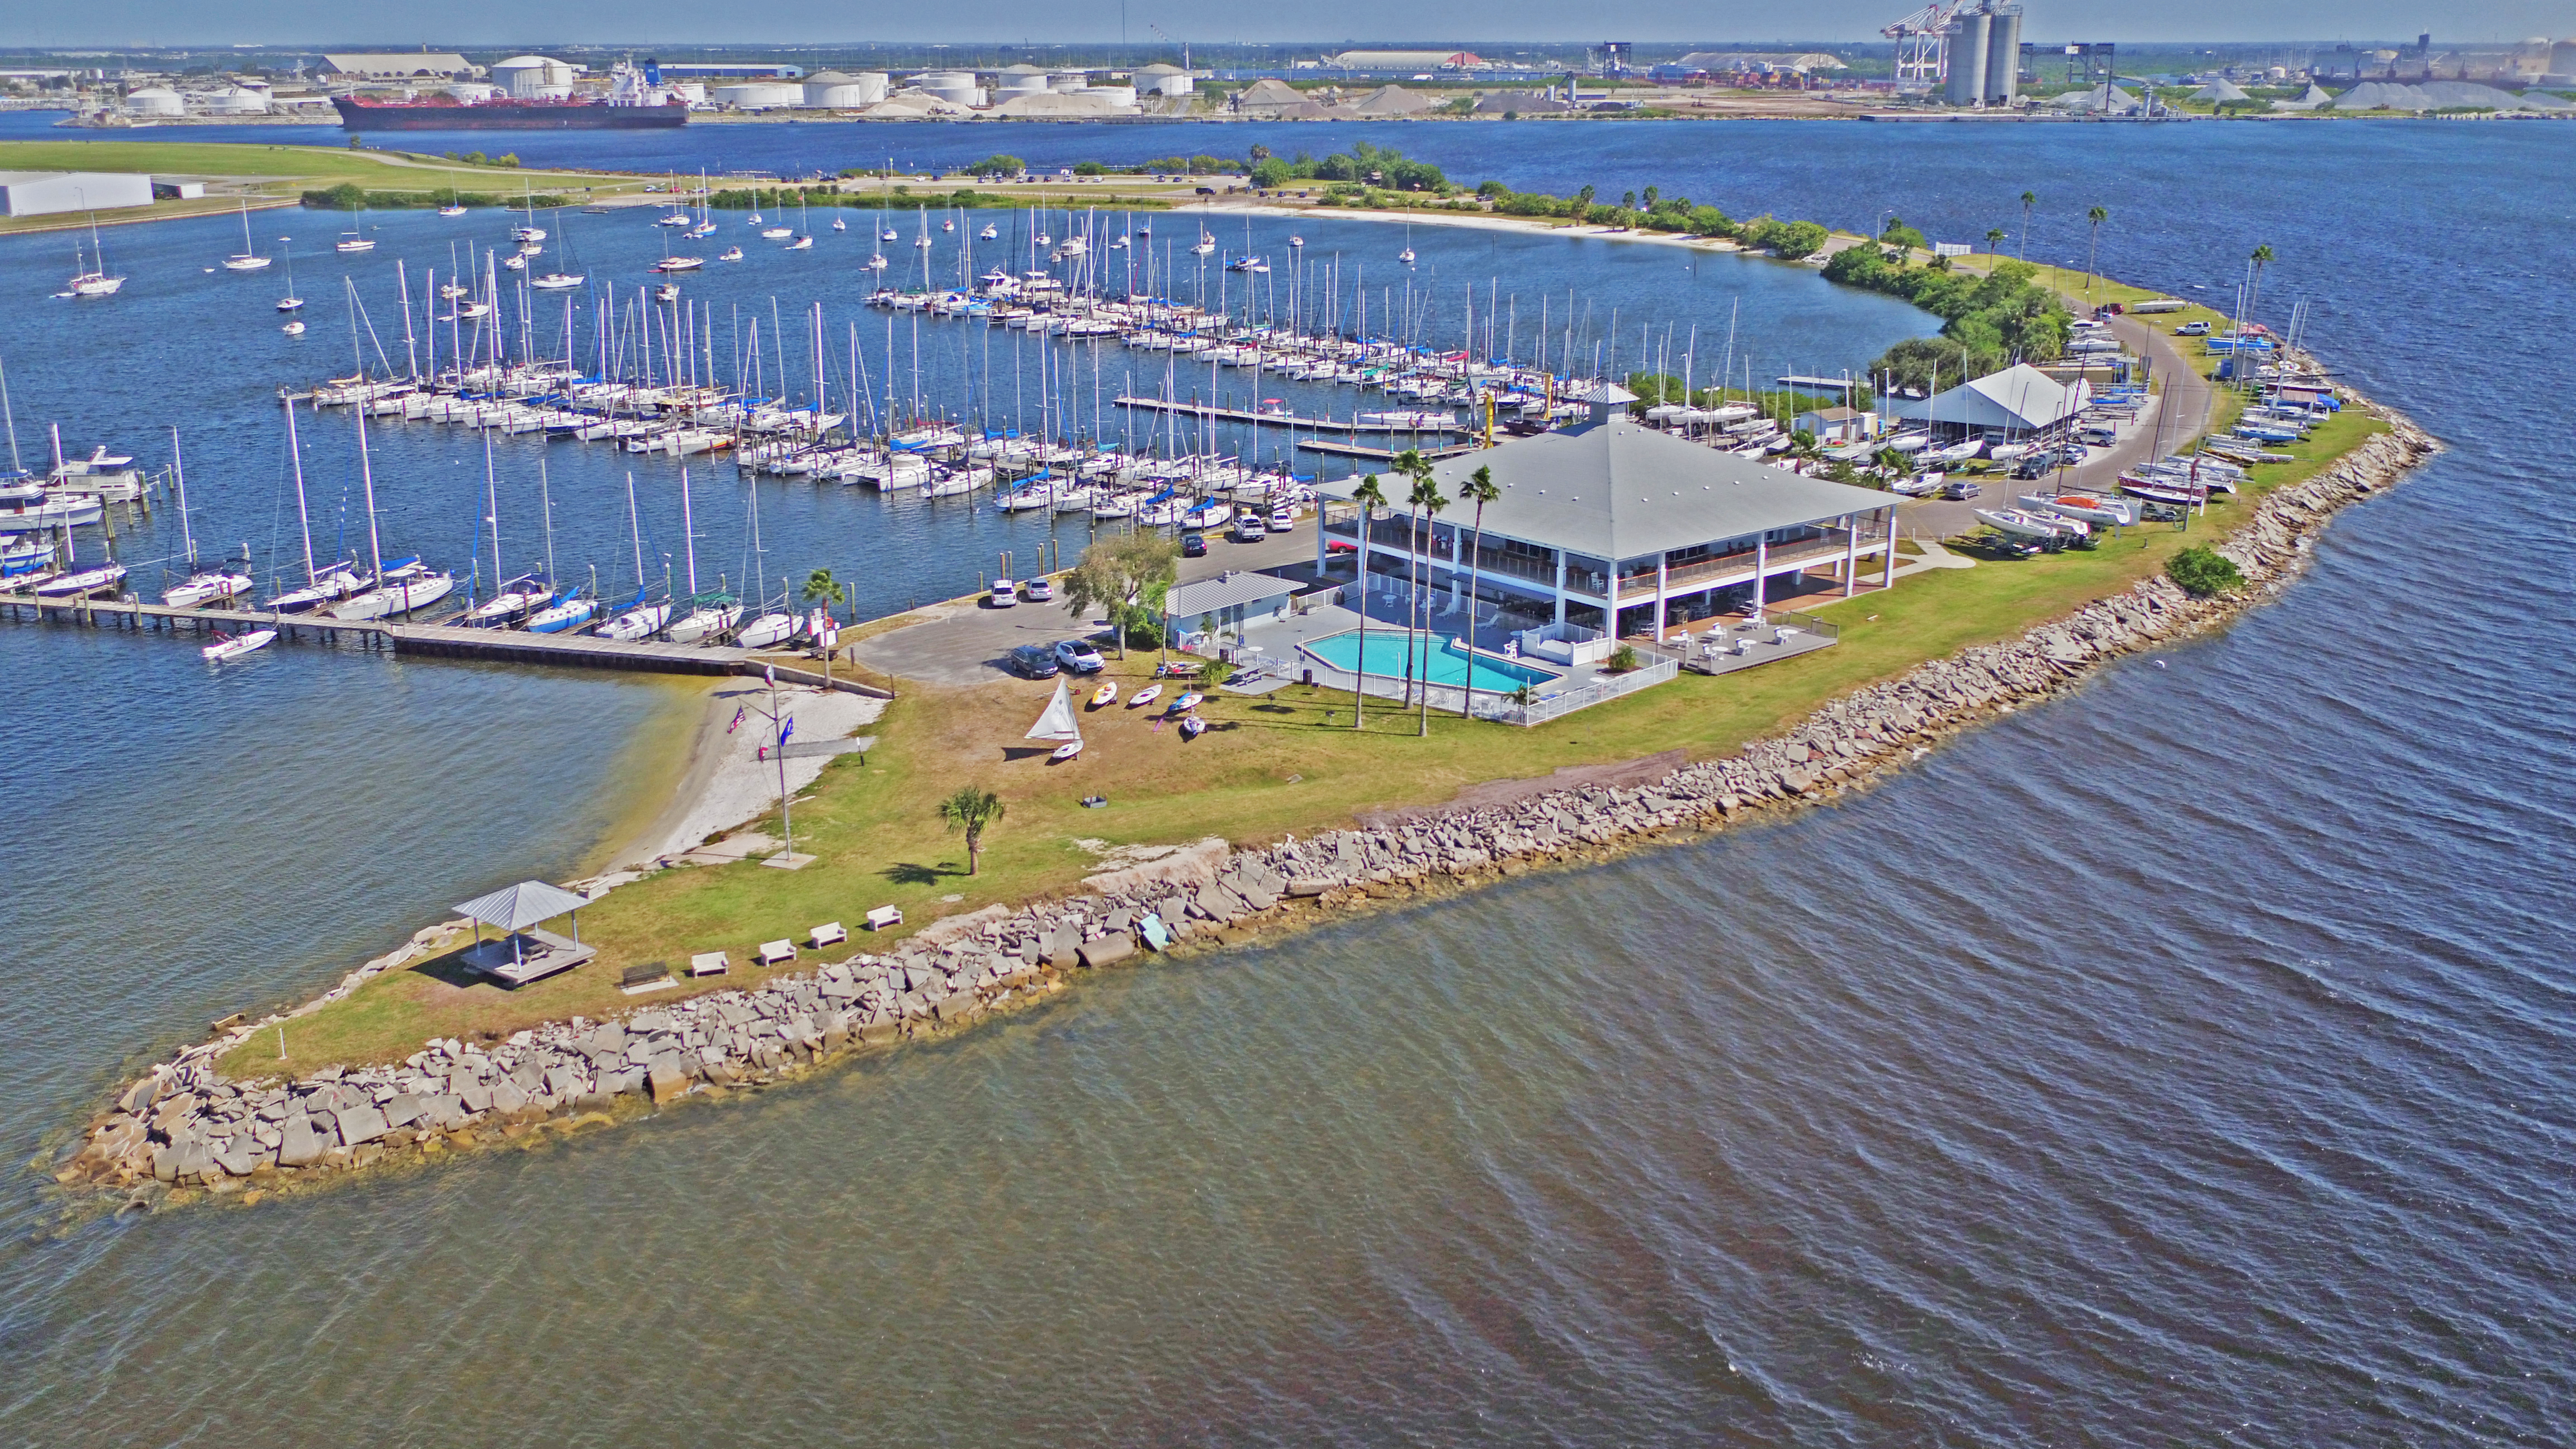 Davis Island Yacht Club